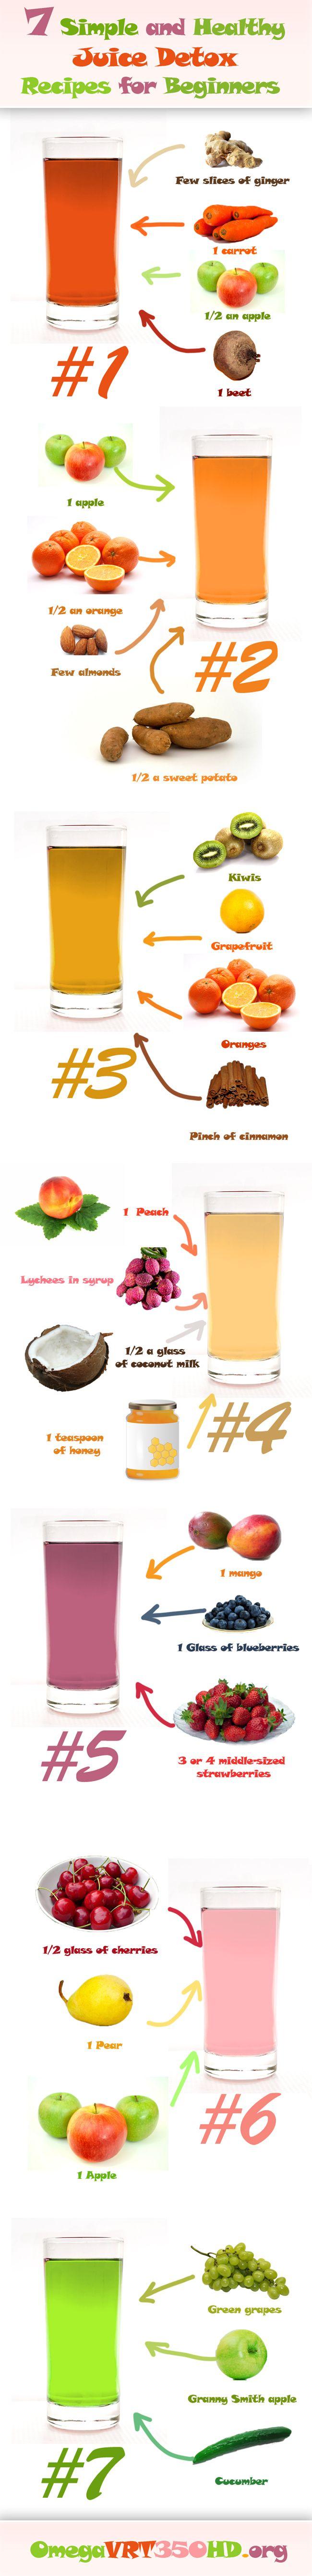 7 Simple Juice Fasting Recipes for Weight Loss and Detox https://omegavrt350hd.org/7-simple-juice-fasting-recipes-for-weight-loss-and-detox-infographic/  #kombuchaguru #juicing Also check out: http://kombuchaguru.com